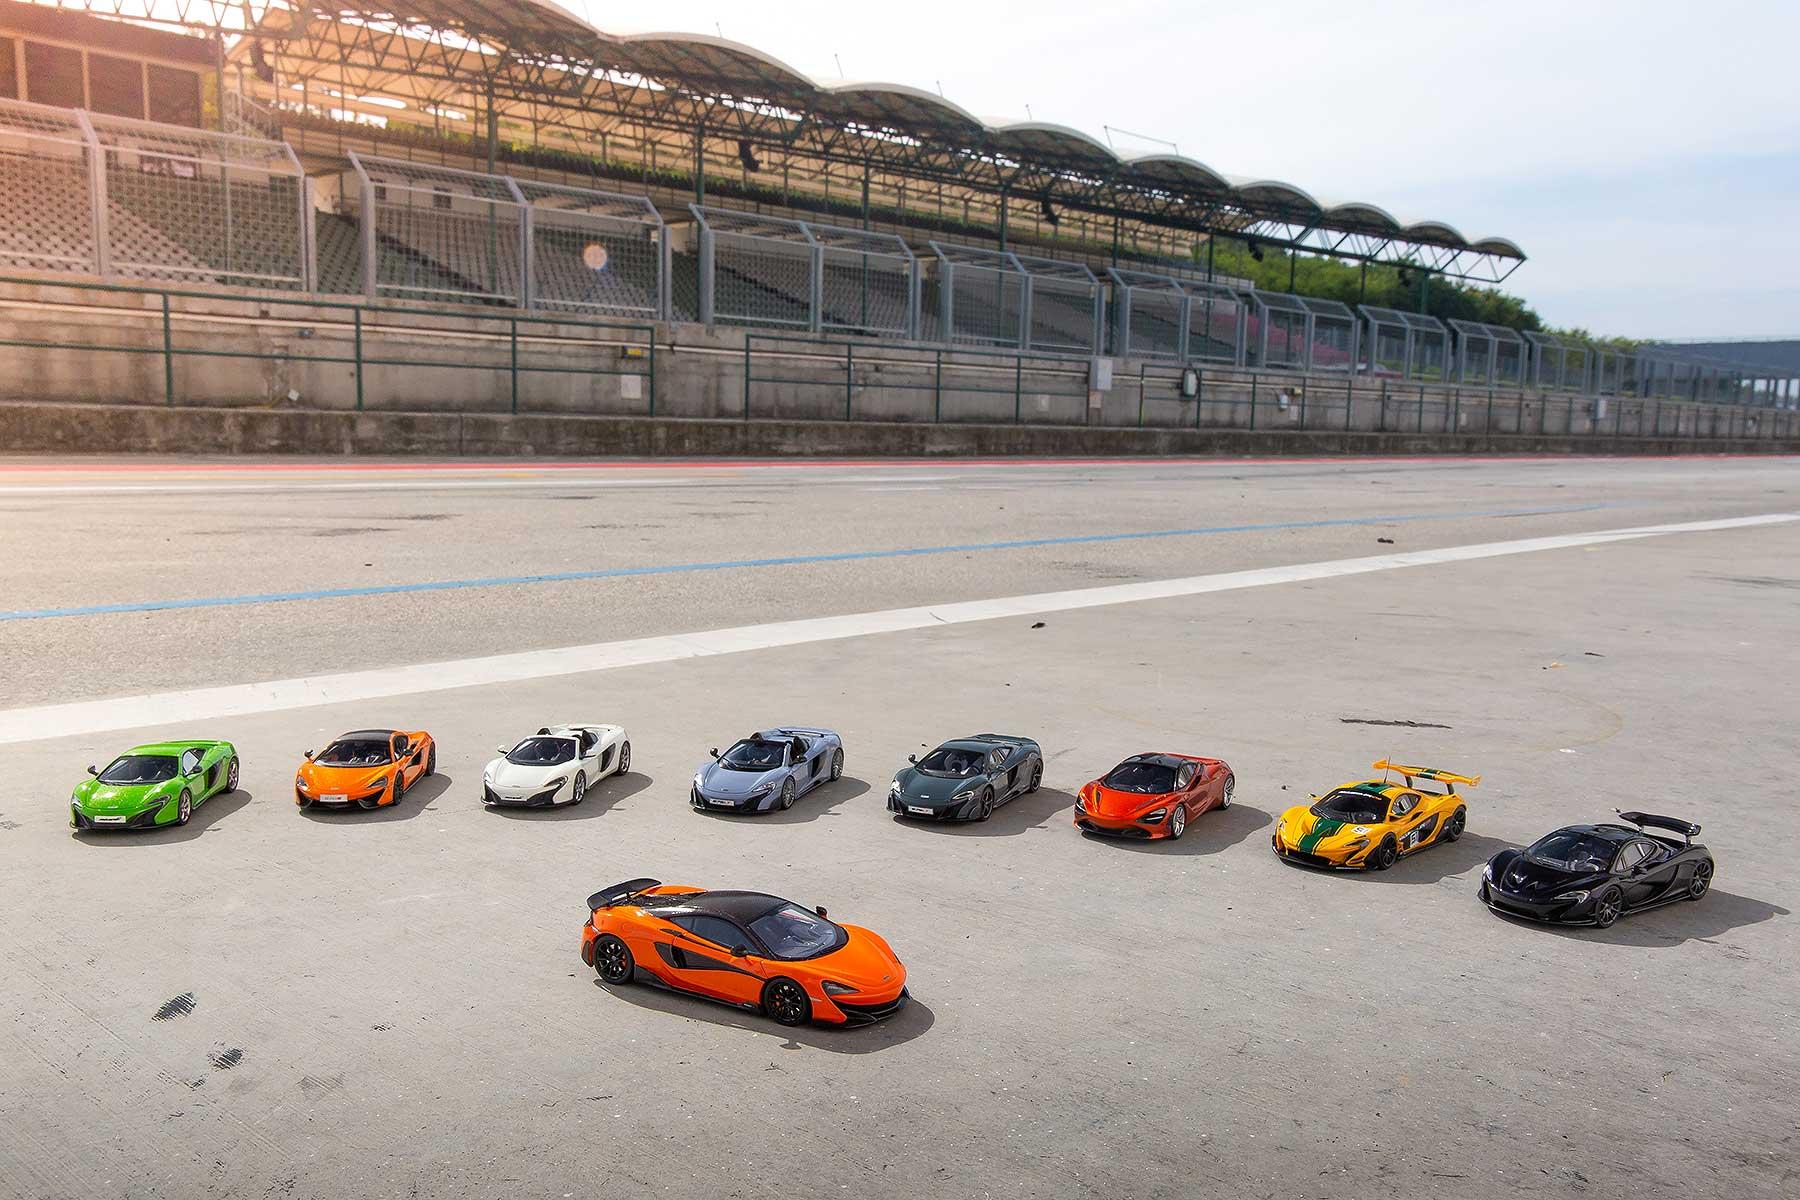 McLaren scale model cars